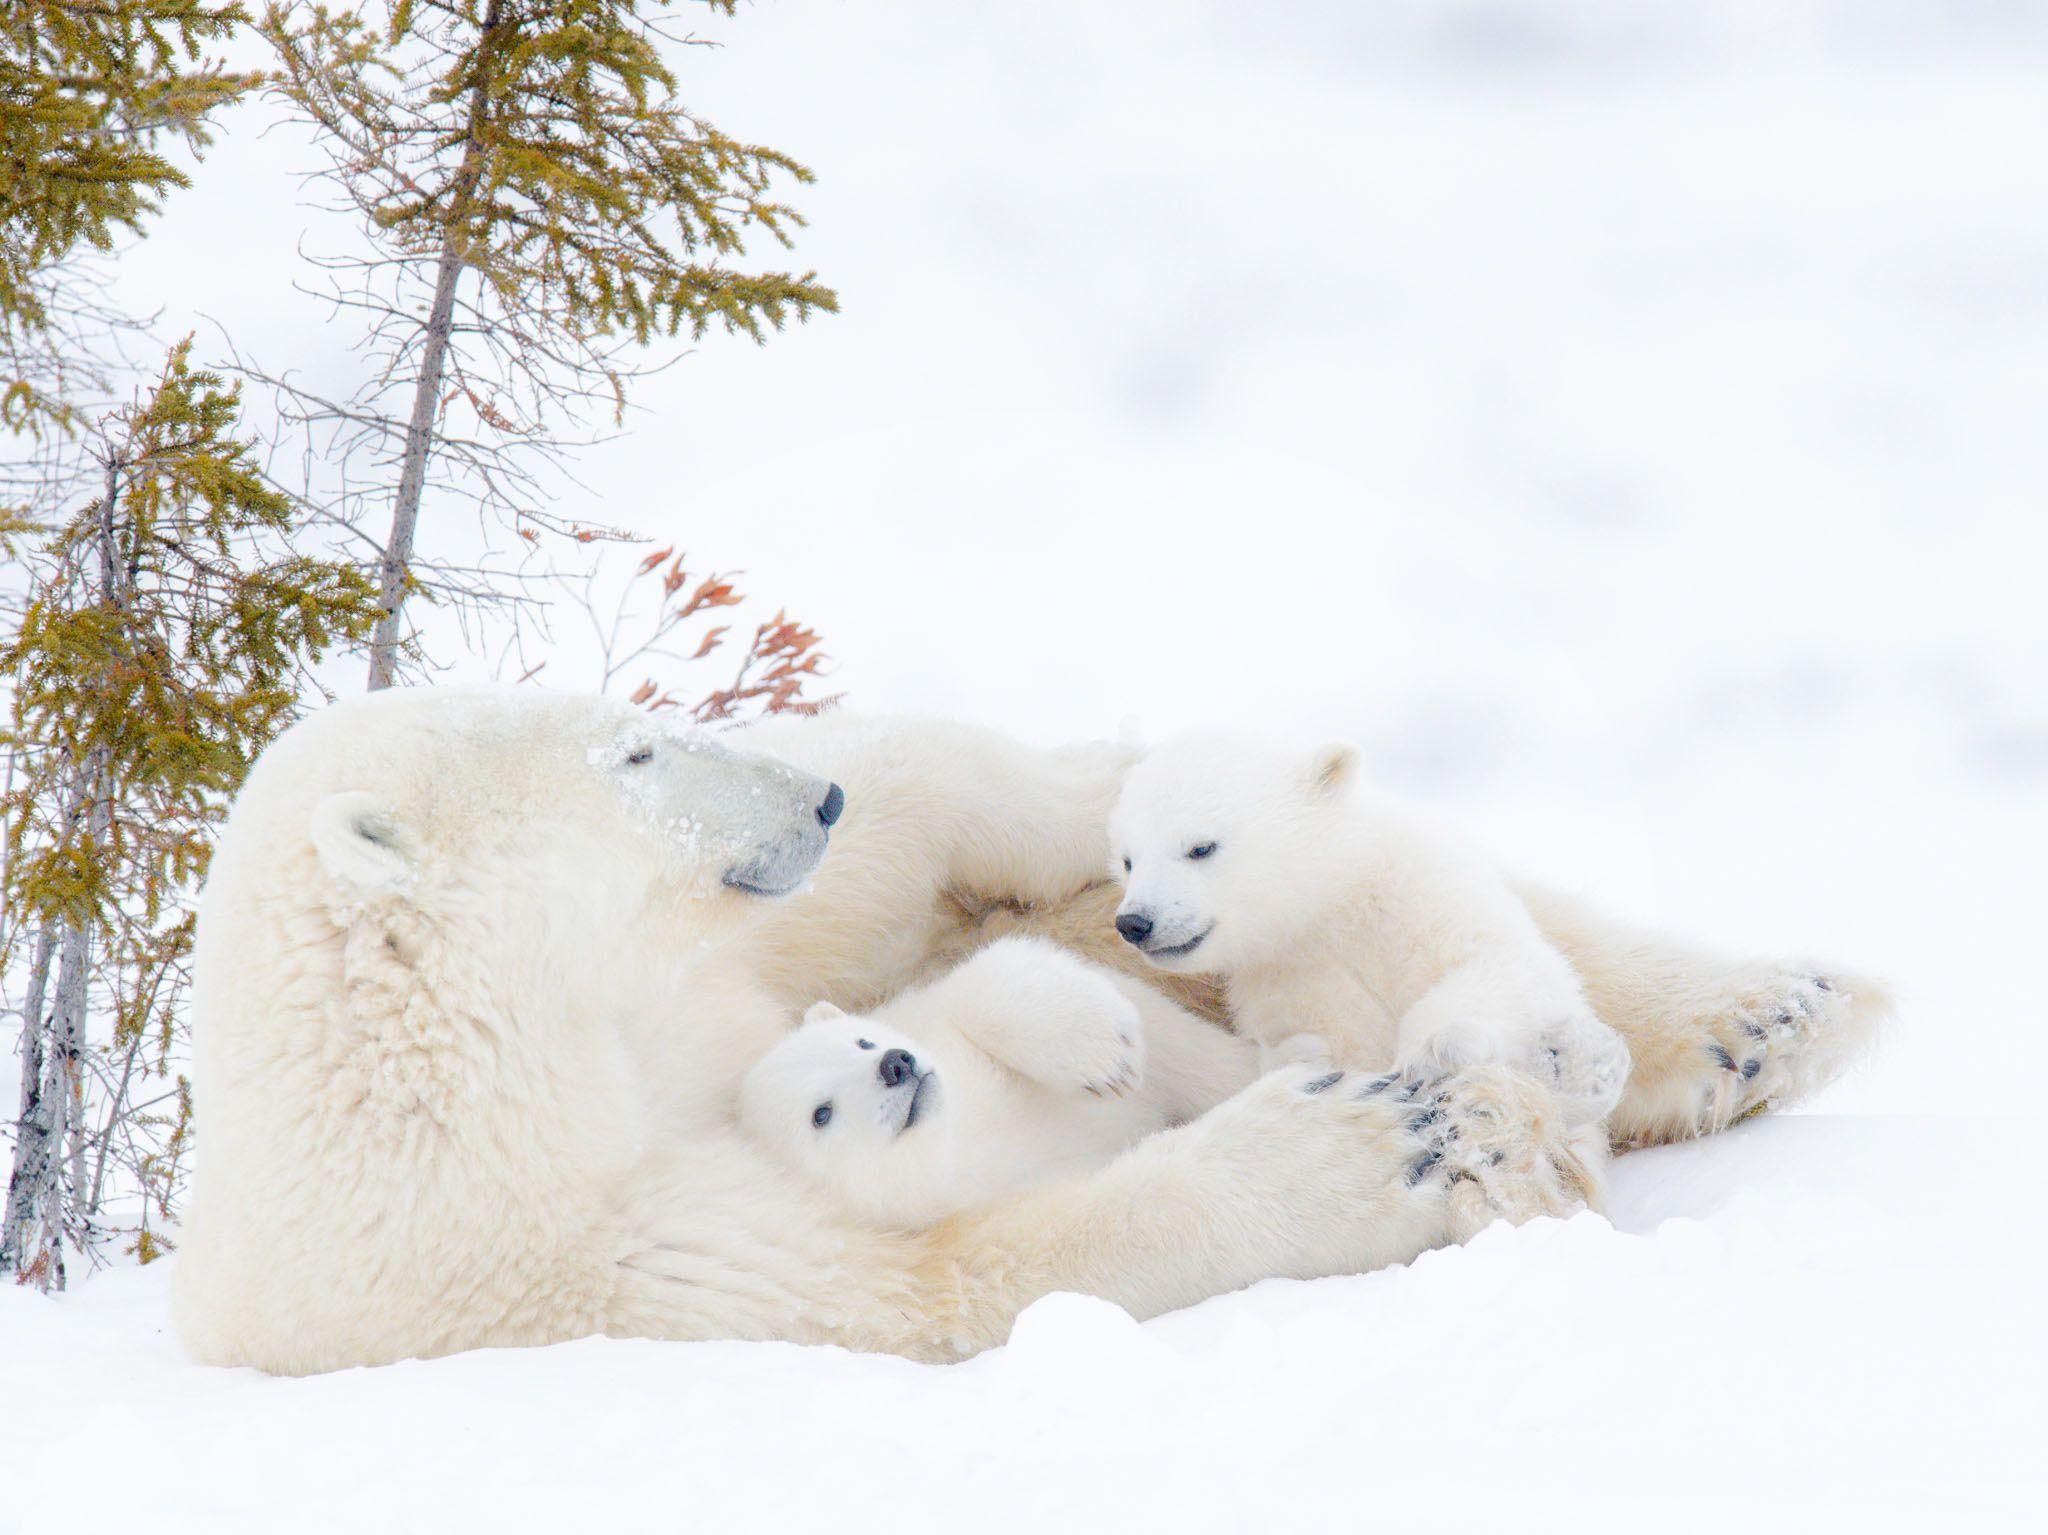 أنثى دُب قطبي (من نوع Ursus maritimus) تستريح مع اثنين من... [Photo of the day - مارس 2021]